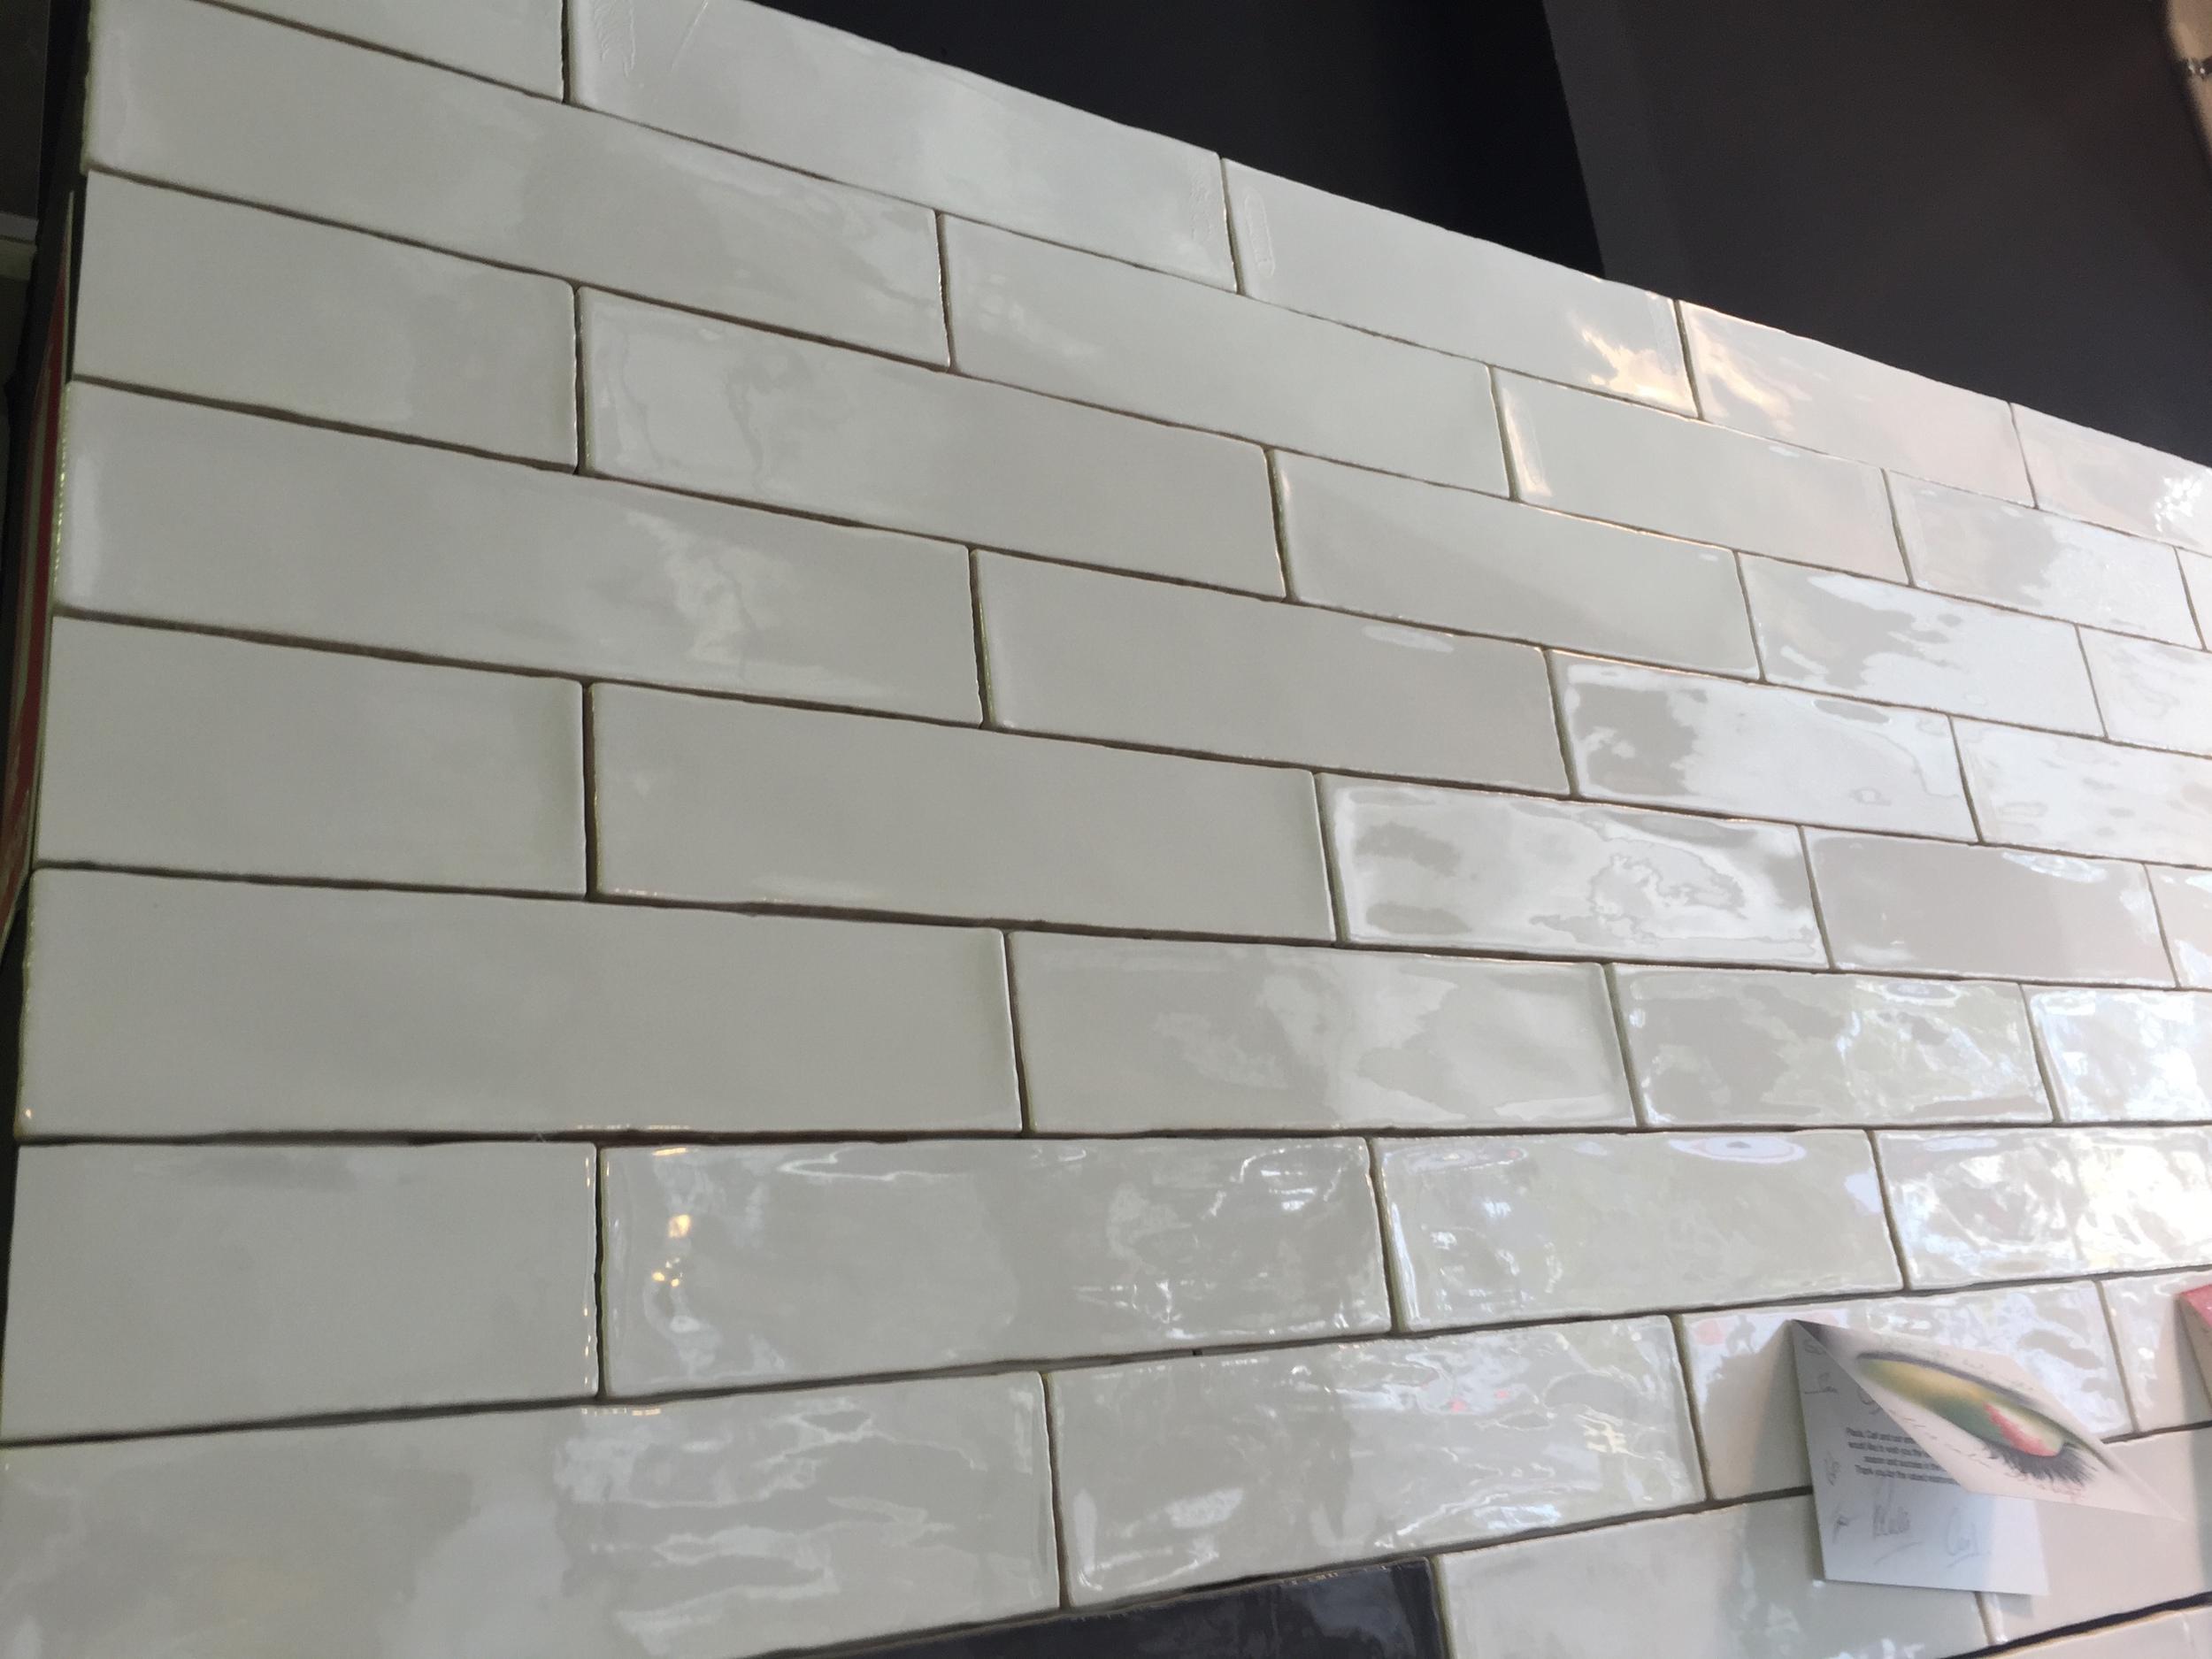 Splash-back tiles in subway